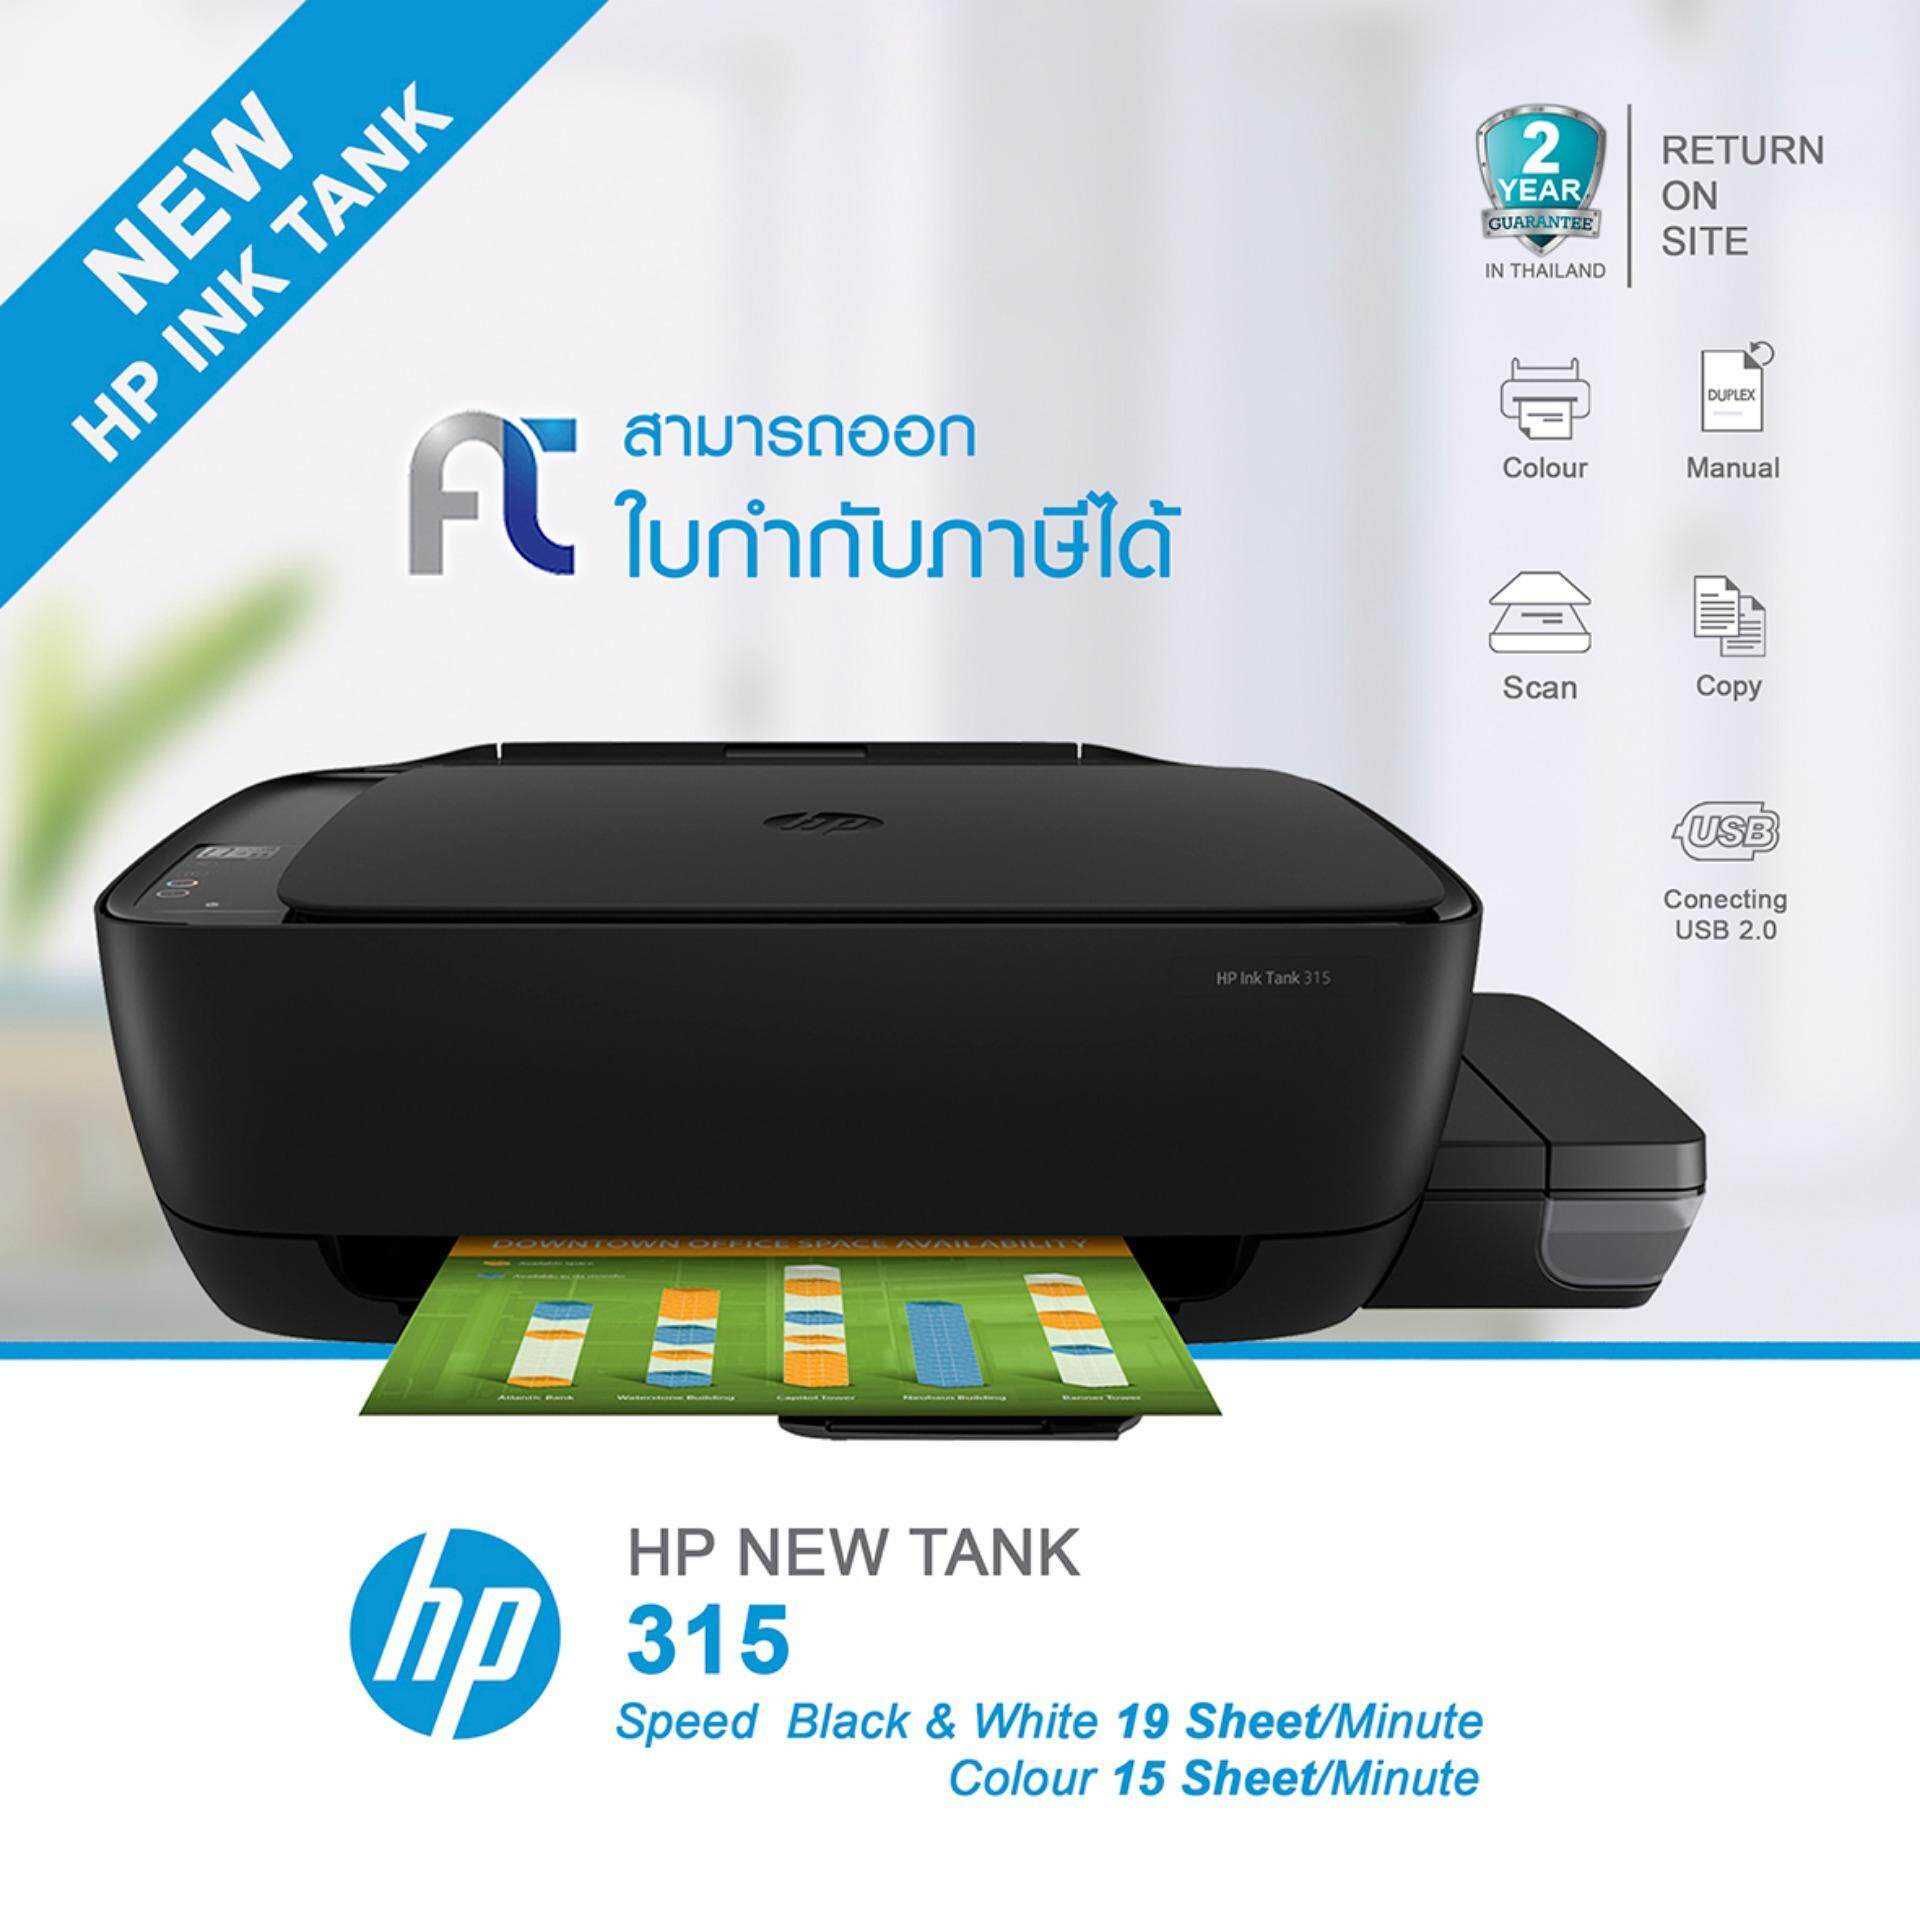 2 Year Warranty Hp Ink Tank 315 Printer (black) .